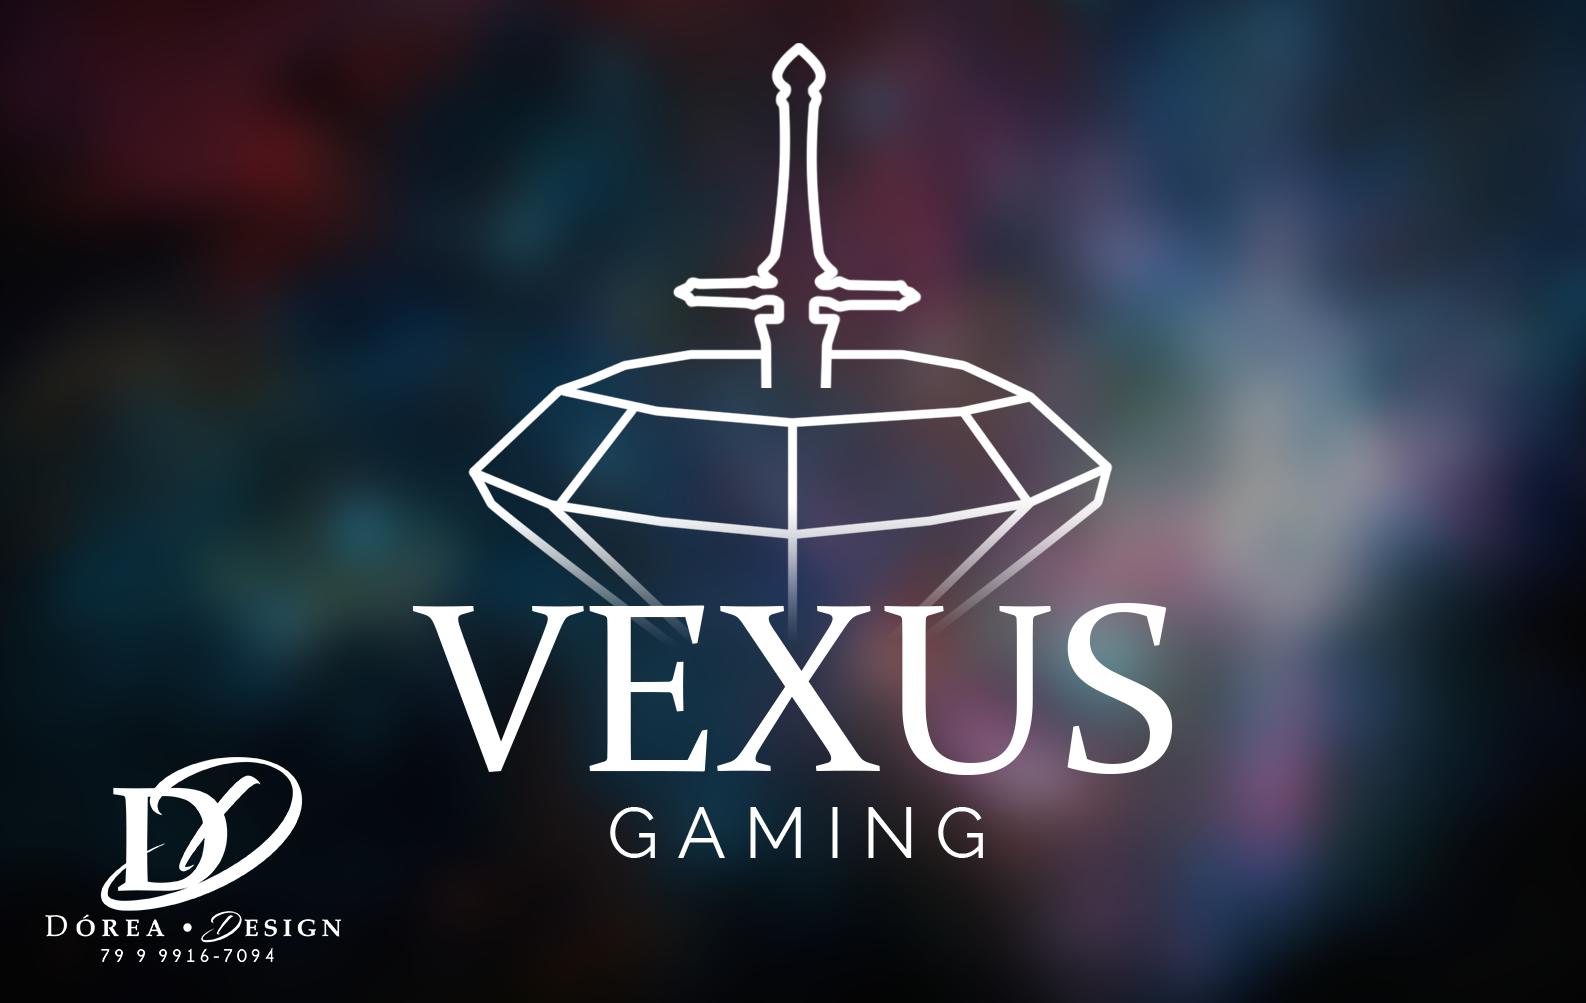 Vexus Gaming